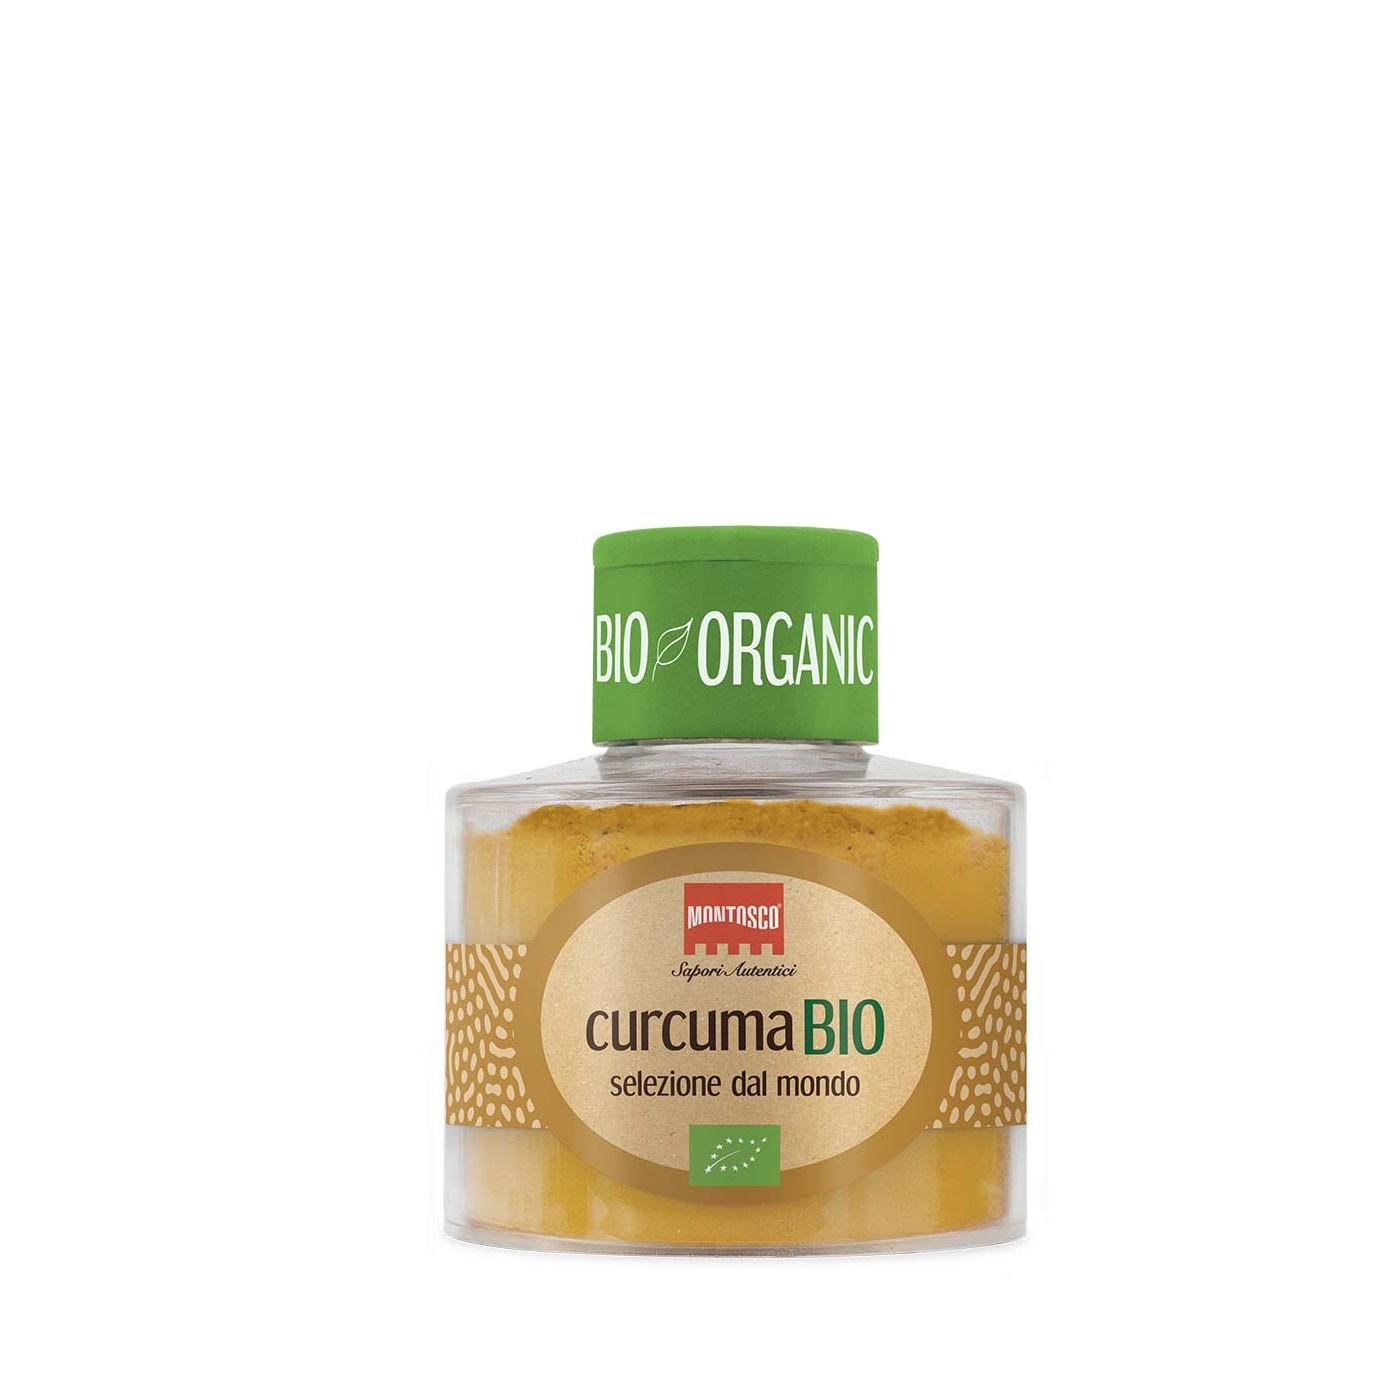 Organic Turmeric 1.51 oz